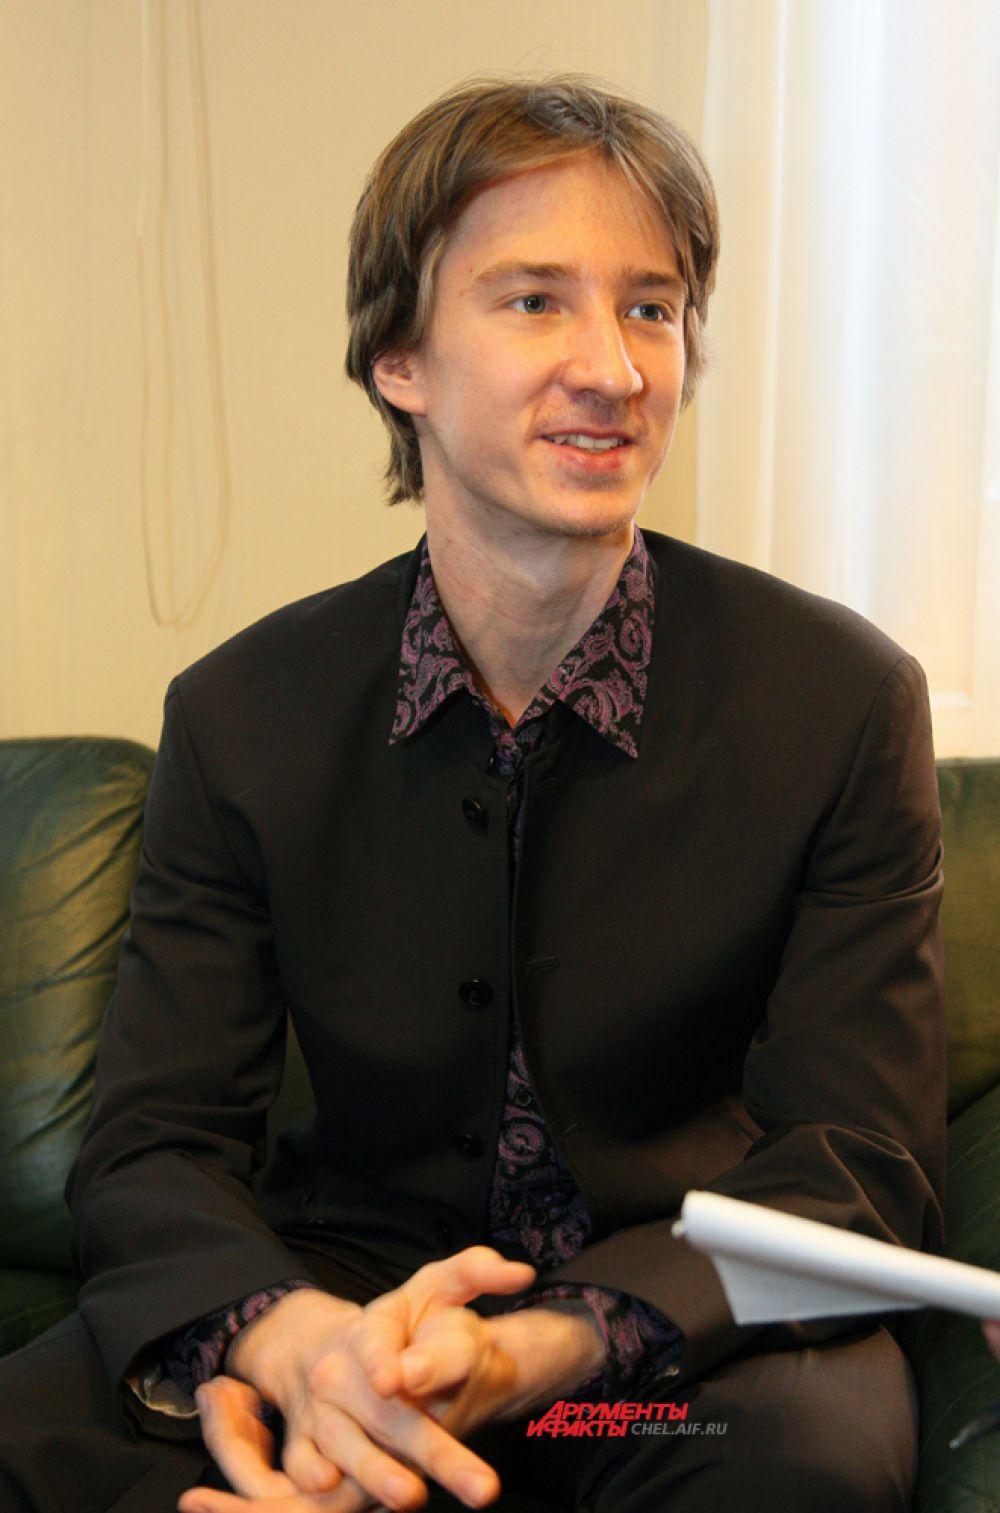 Вадим Мунтагиров